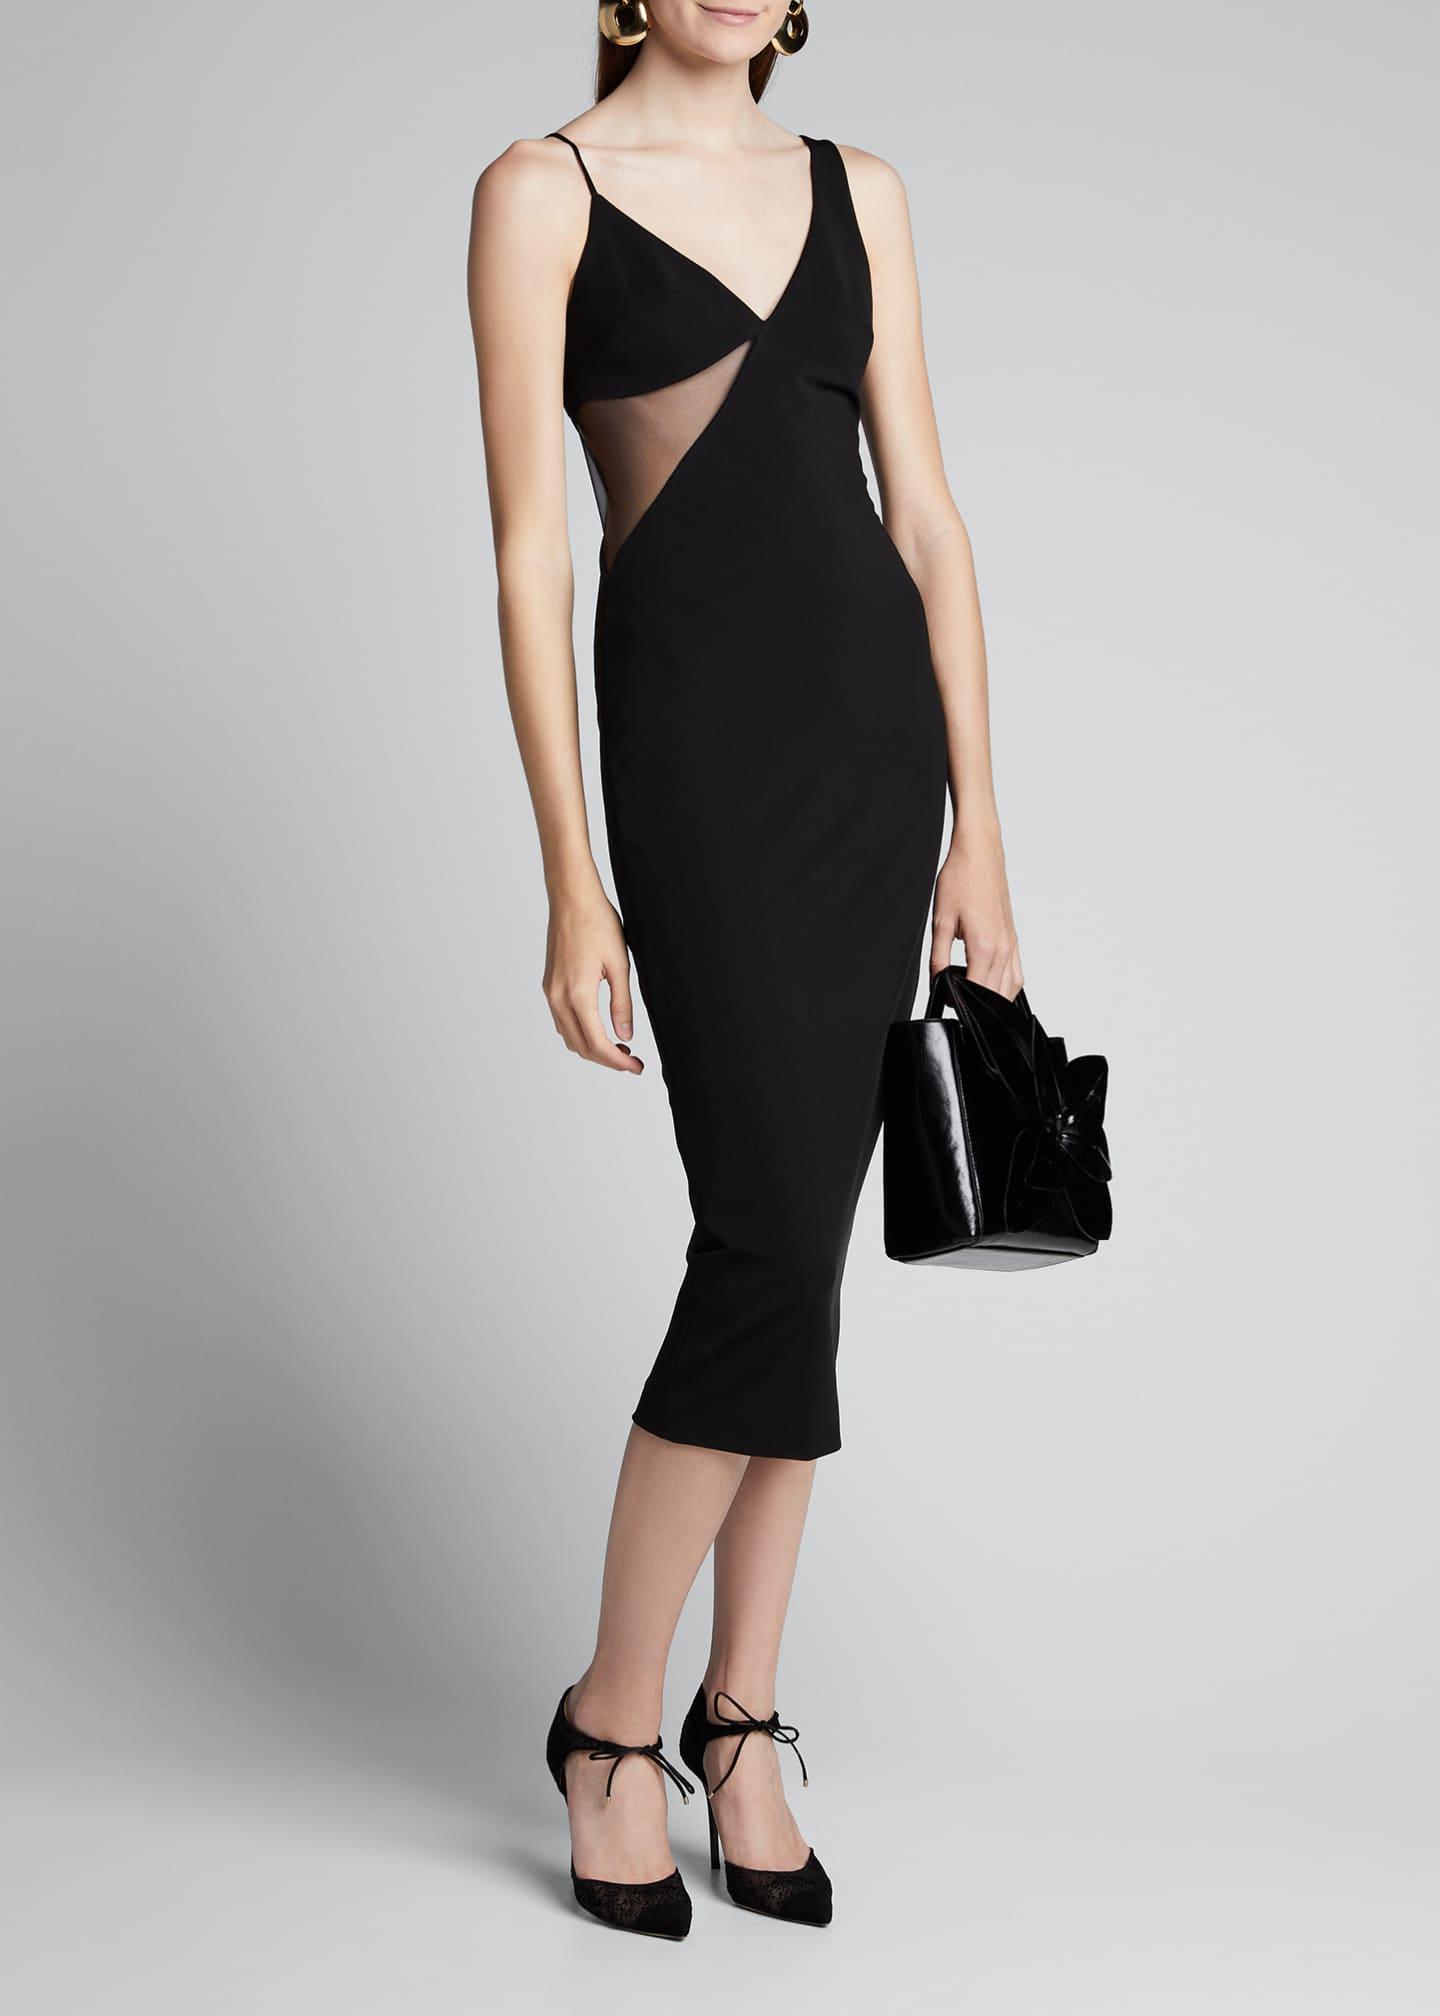 David Koma Tulle-Trim Body-Con Dress